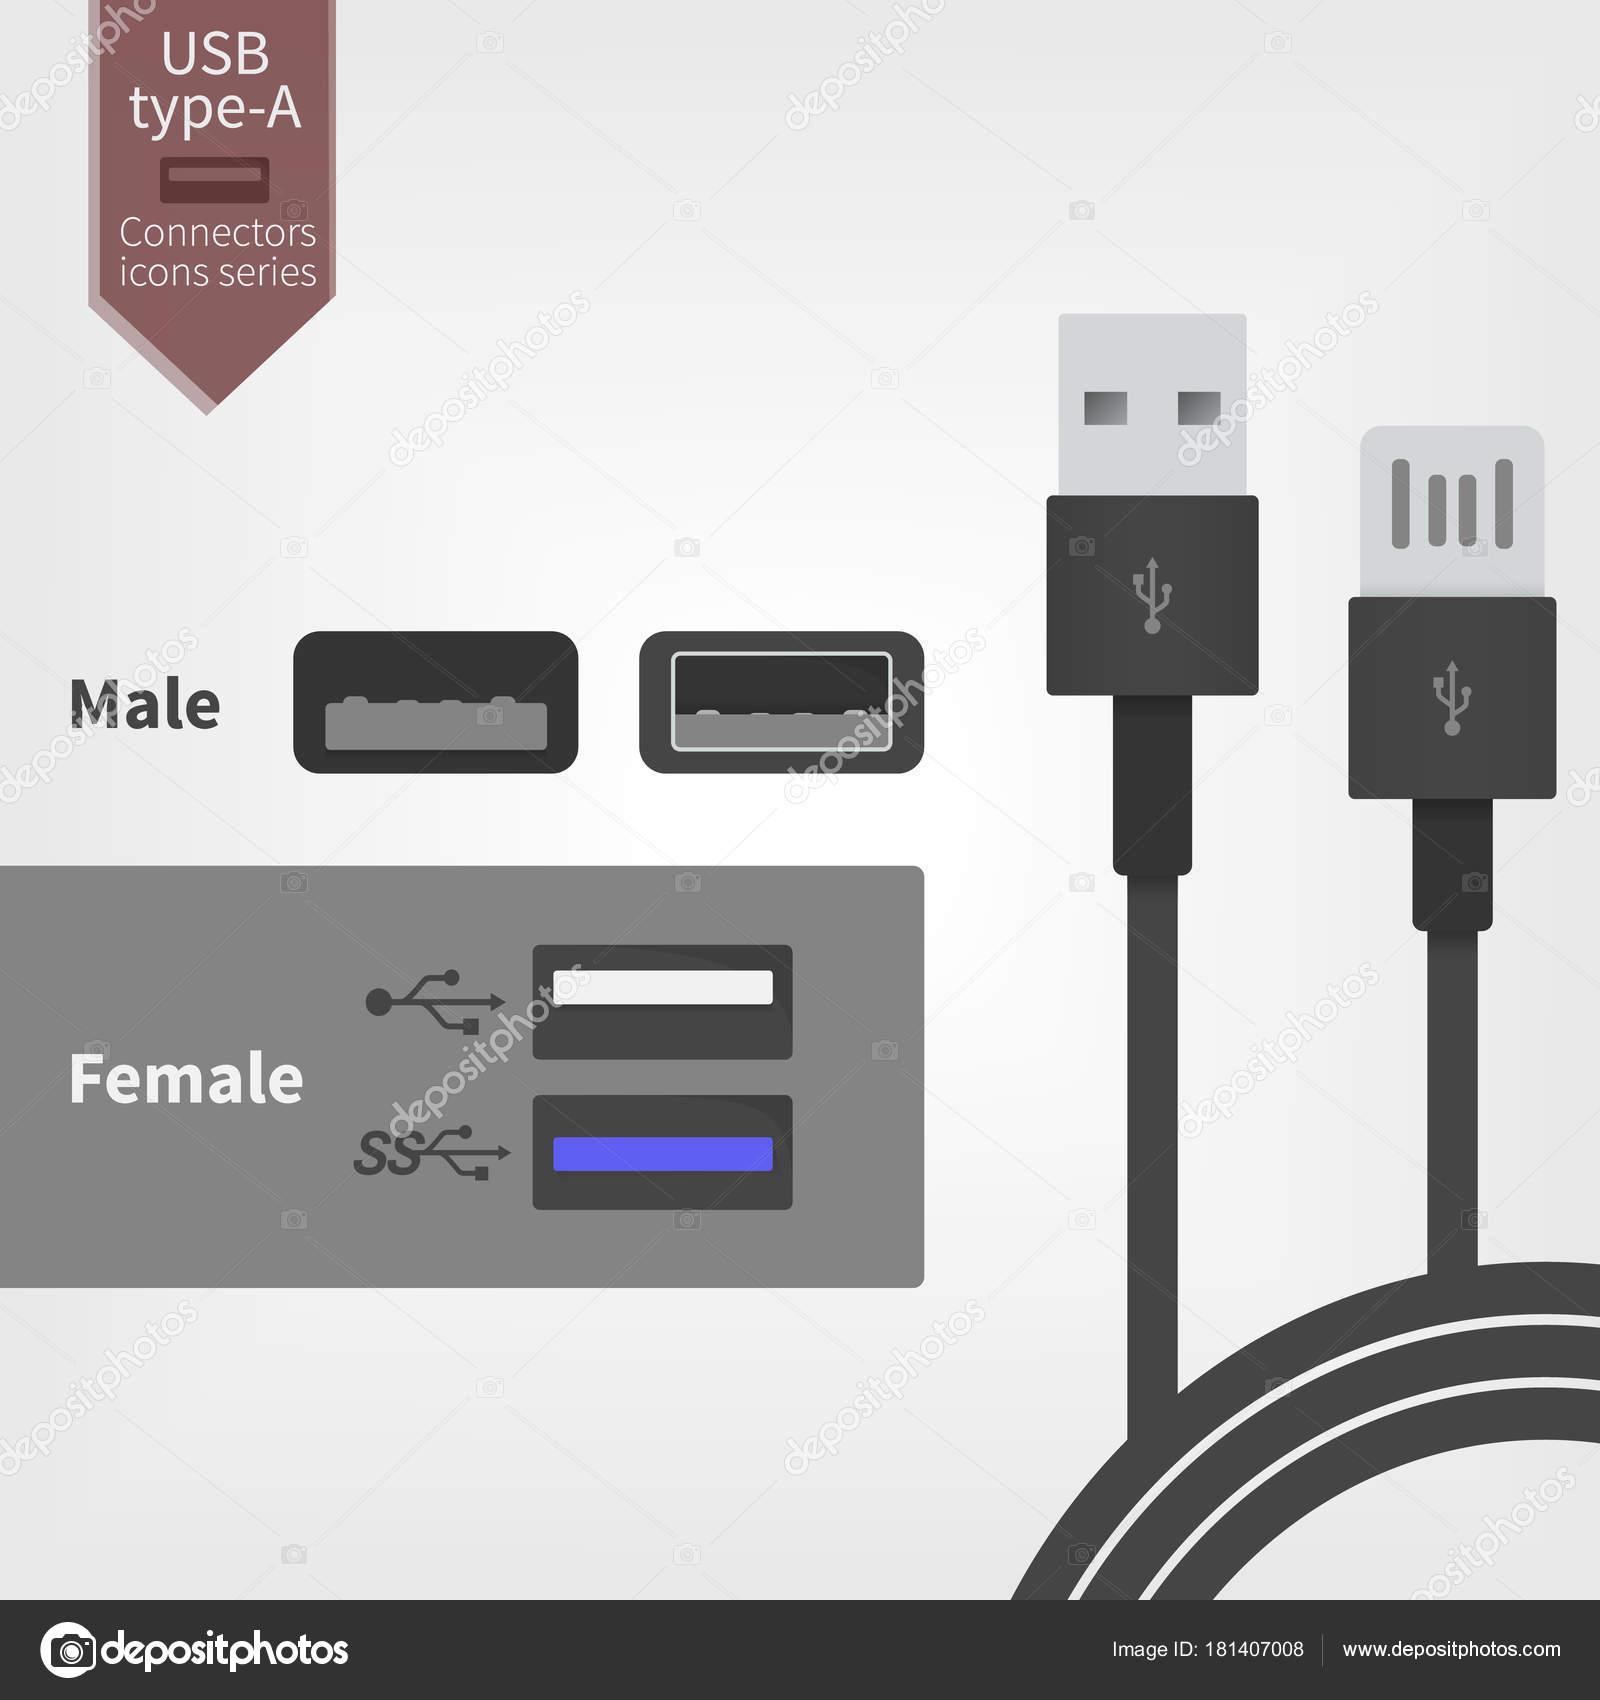 usb-steckdose steckdose und stecker kabel. vektor-illustration im